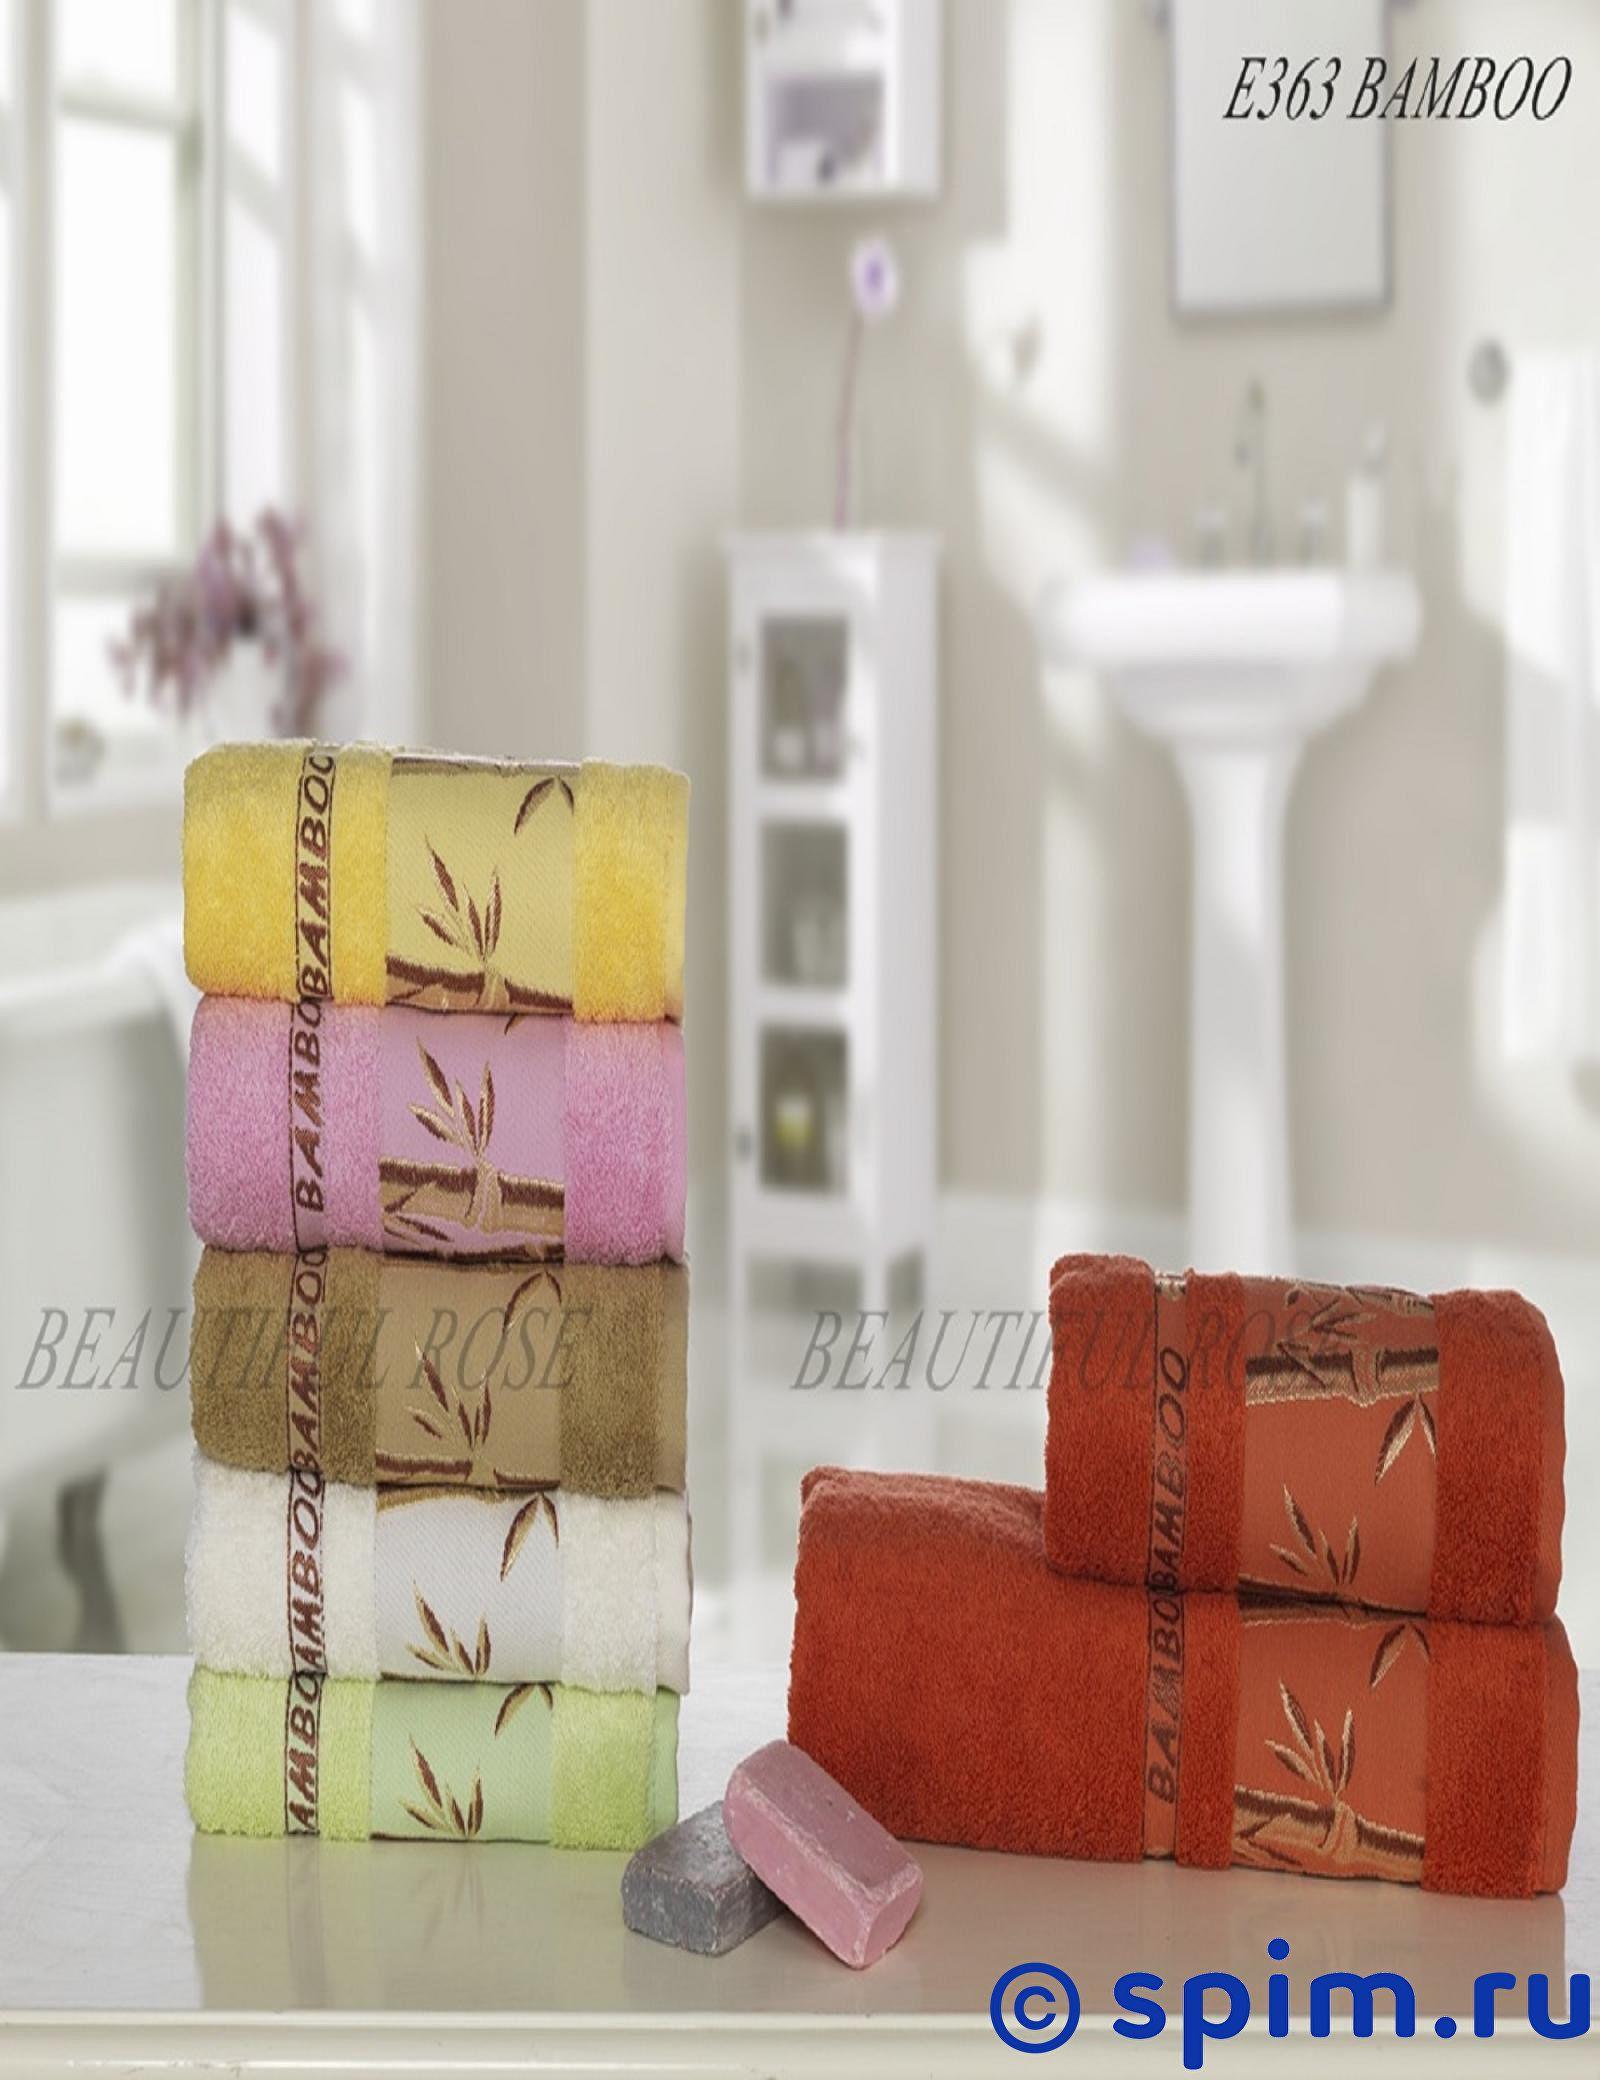 Полотенце Rose Бамбук E363 70х140 см (6 шт.) 70х140 см полотенце кухонное бамбук 40х60см клетка жакк в ассортименте 30% хлопок 70% бамбук